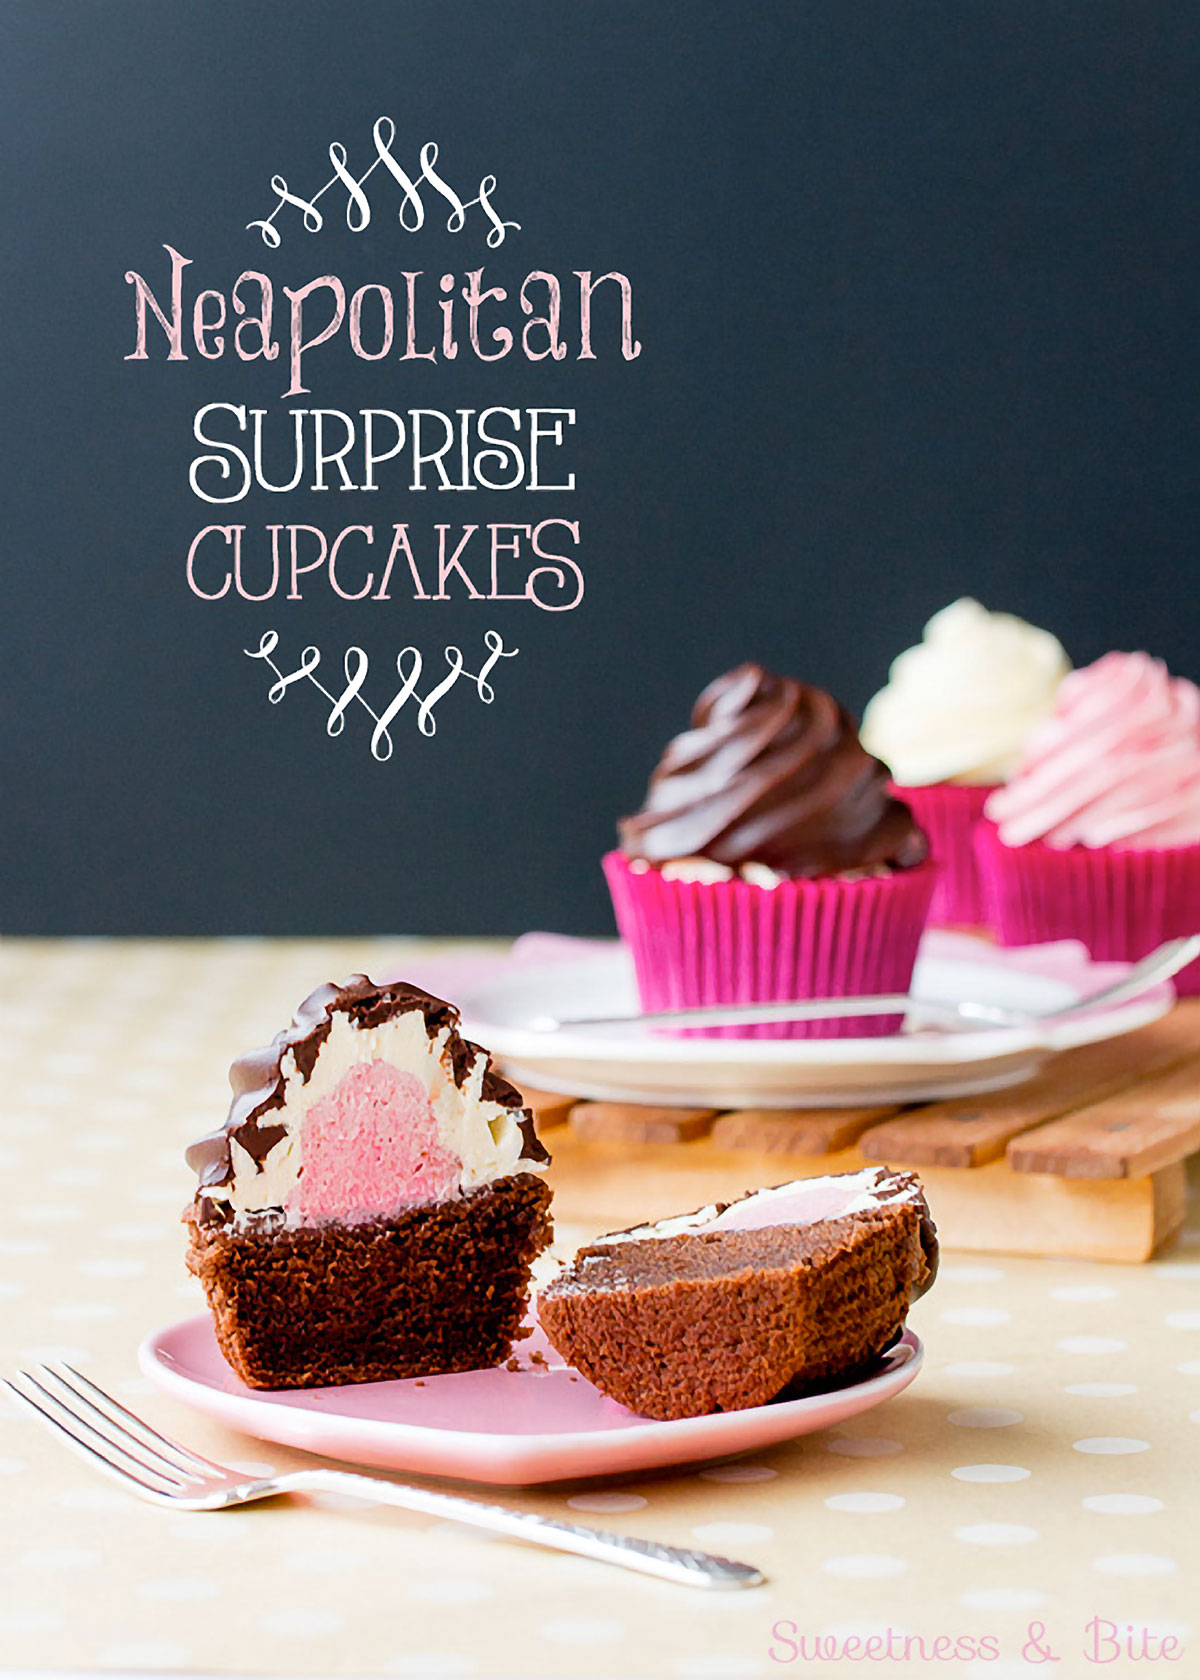 Neapolitan Surprise Cupcakes